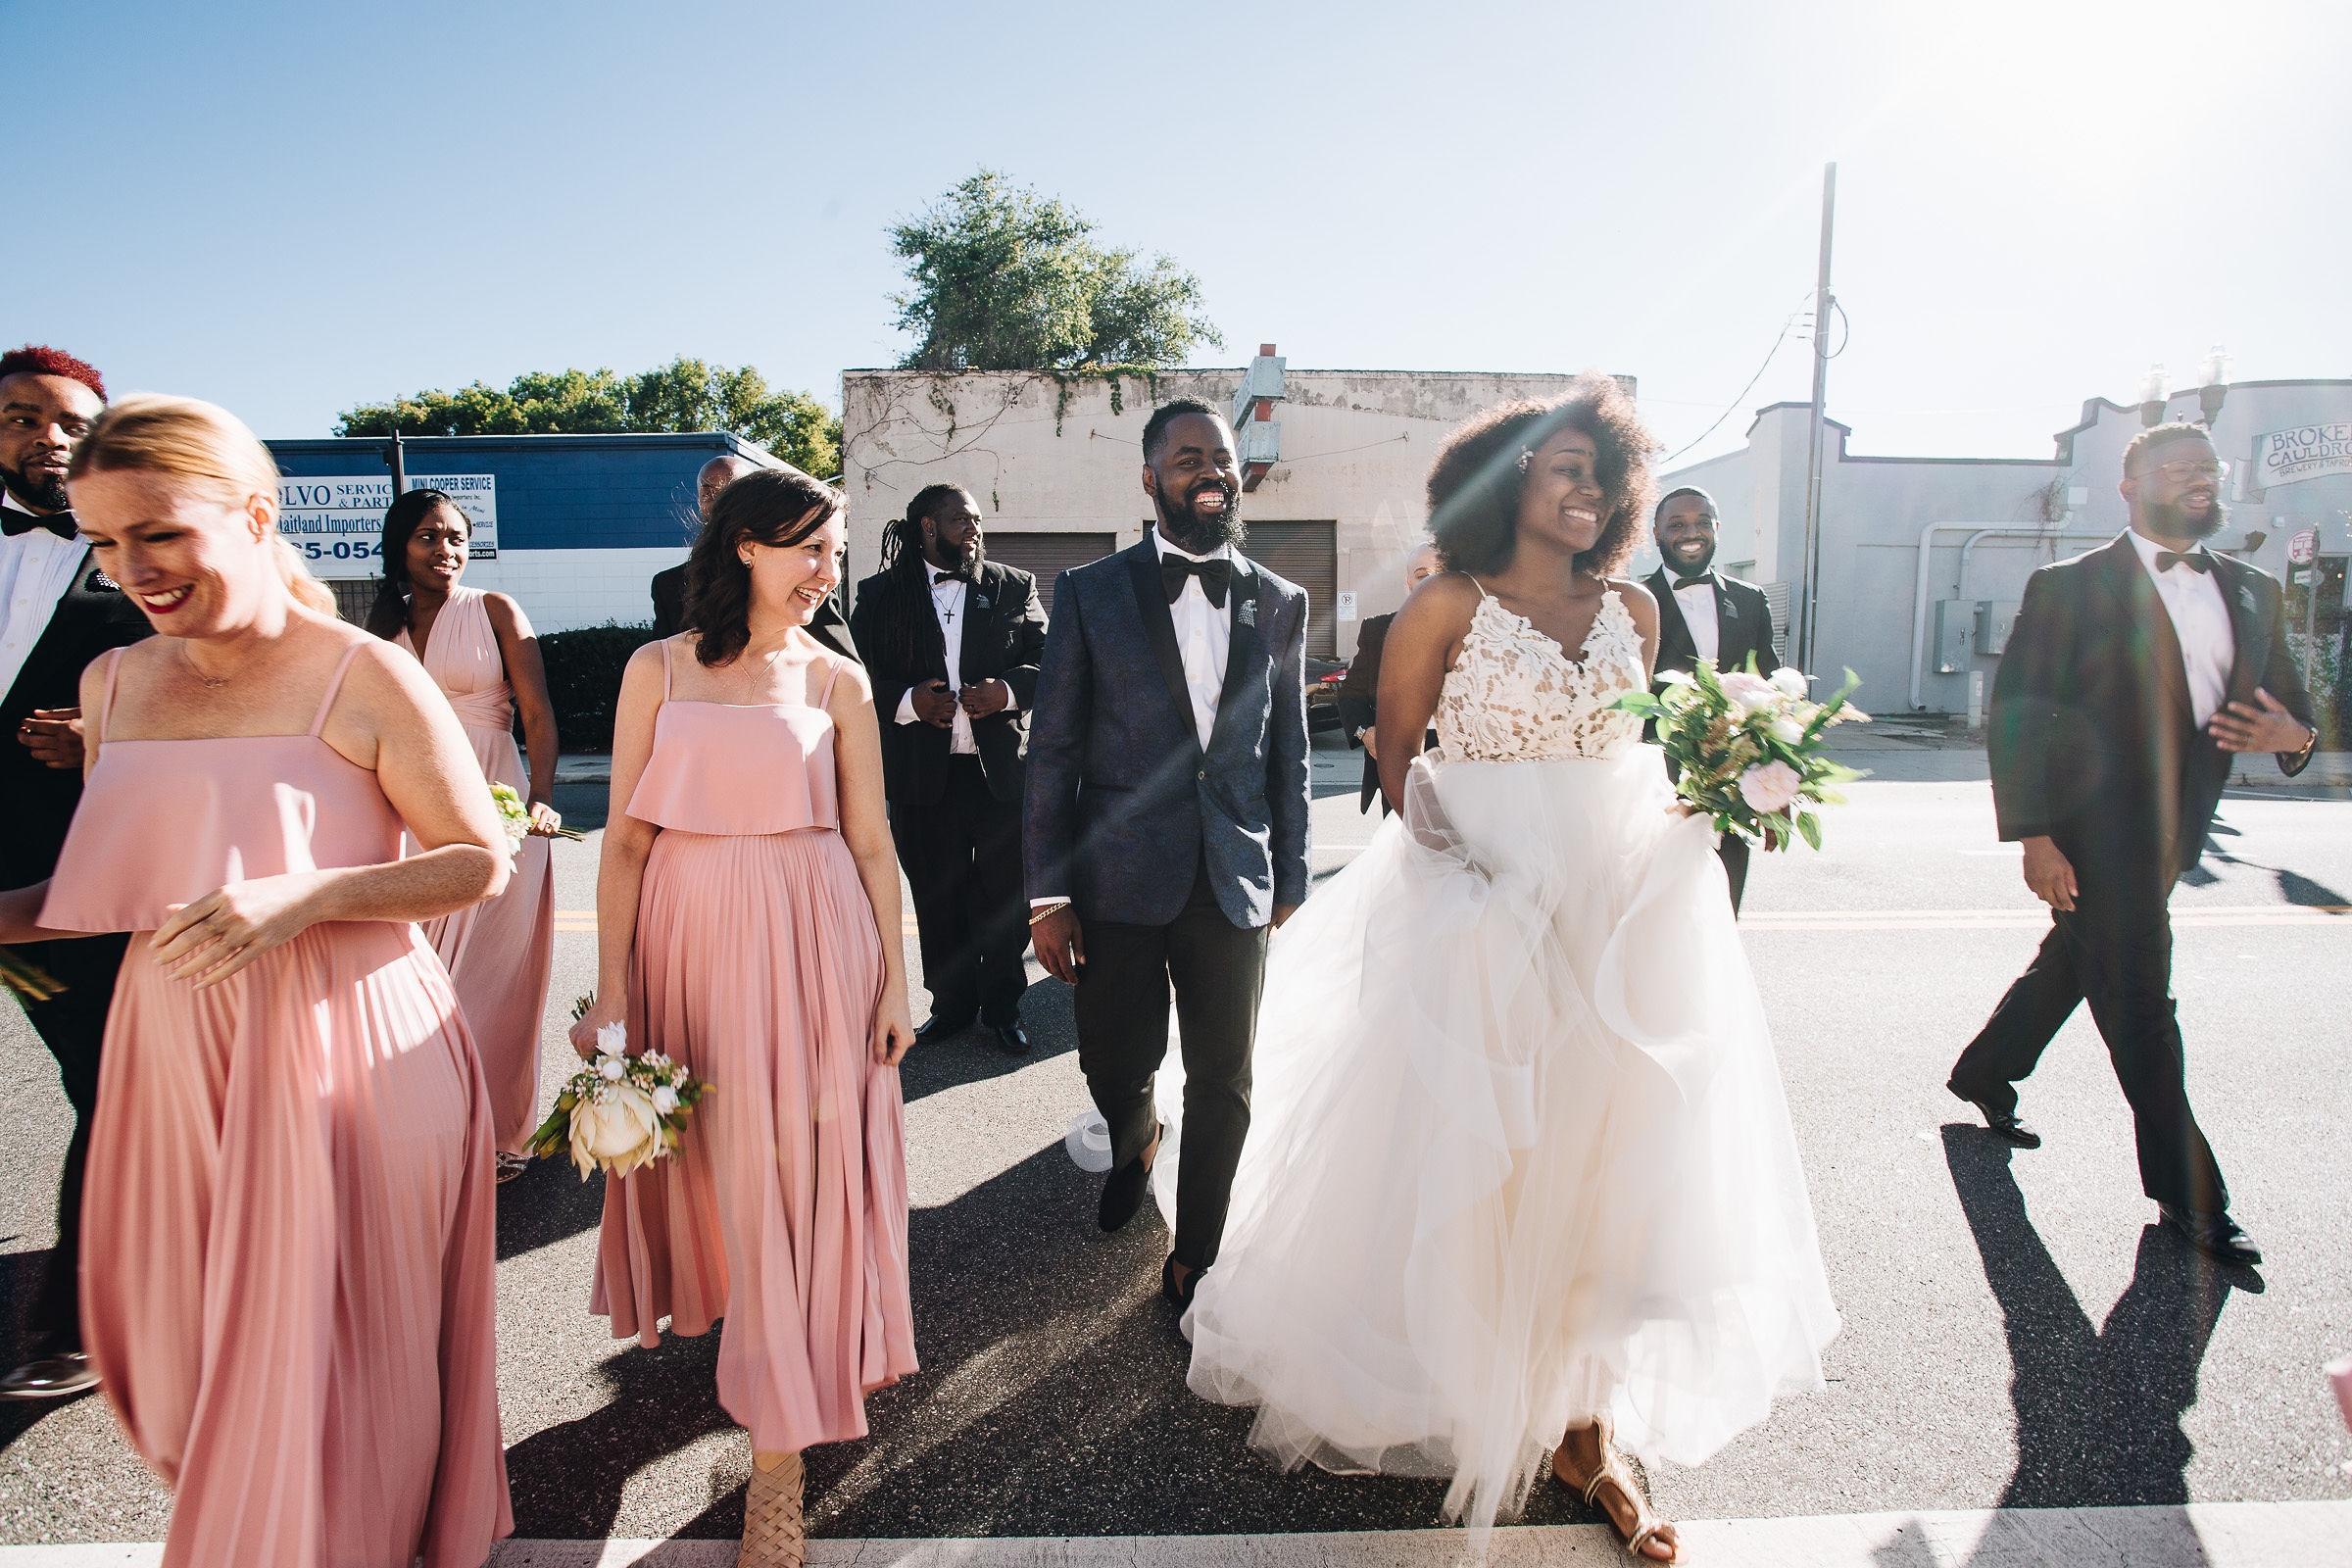 Credit: Marcia's Weddings